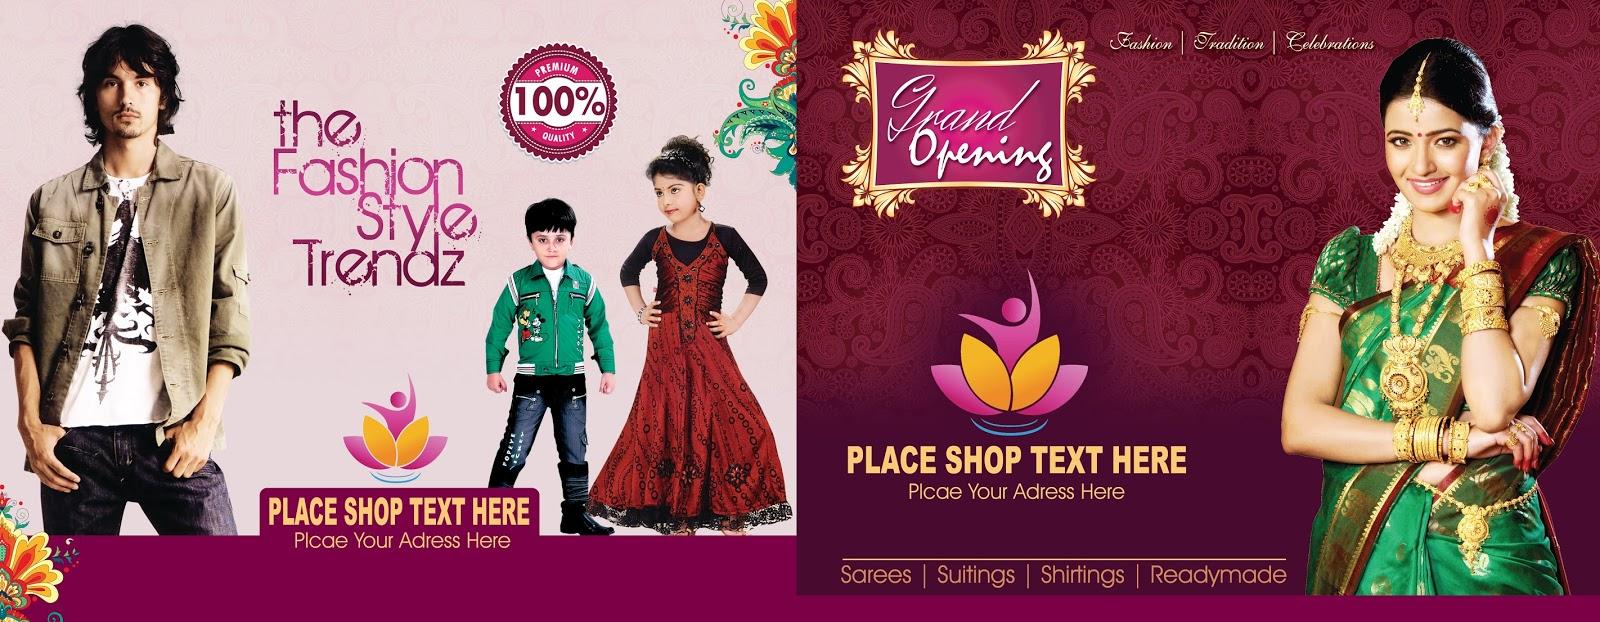 Grand opening invitation card photoshop psd template free saree centre grand opening invitation cards psd templates stopboris Choice Image